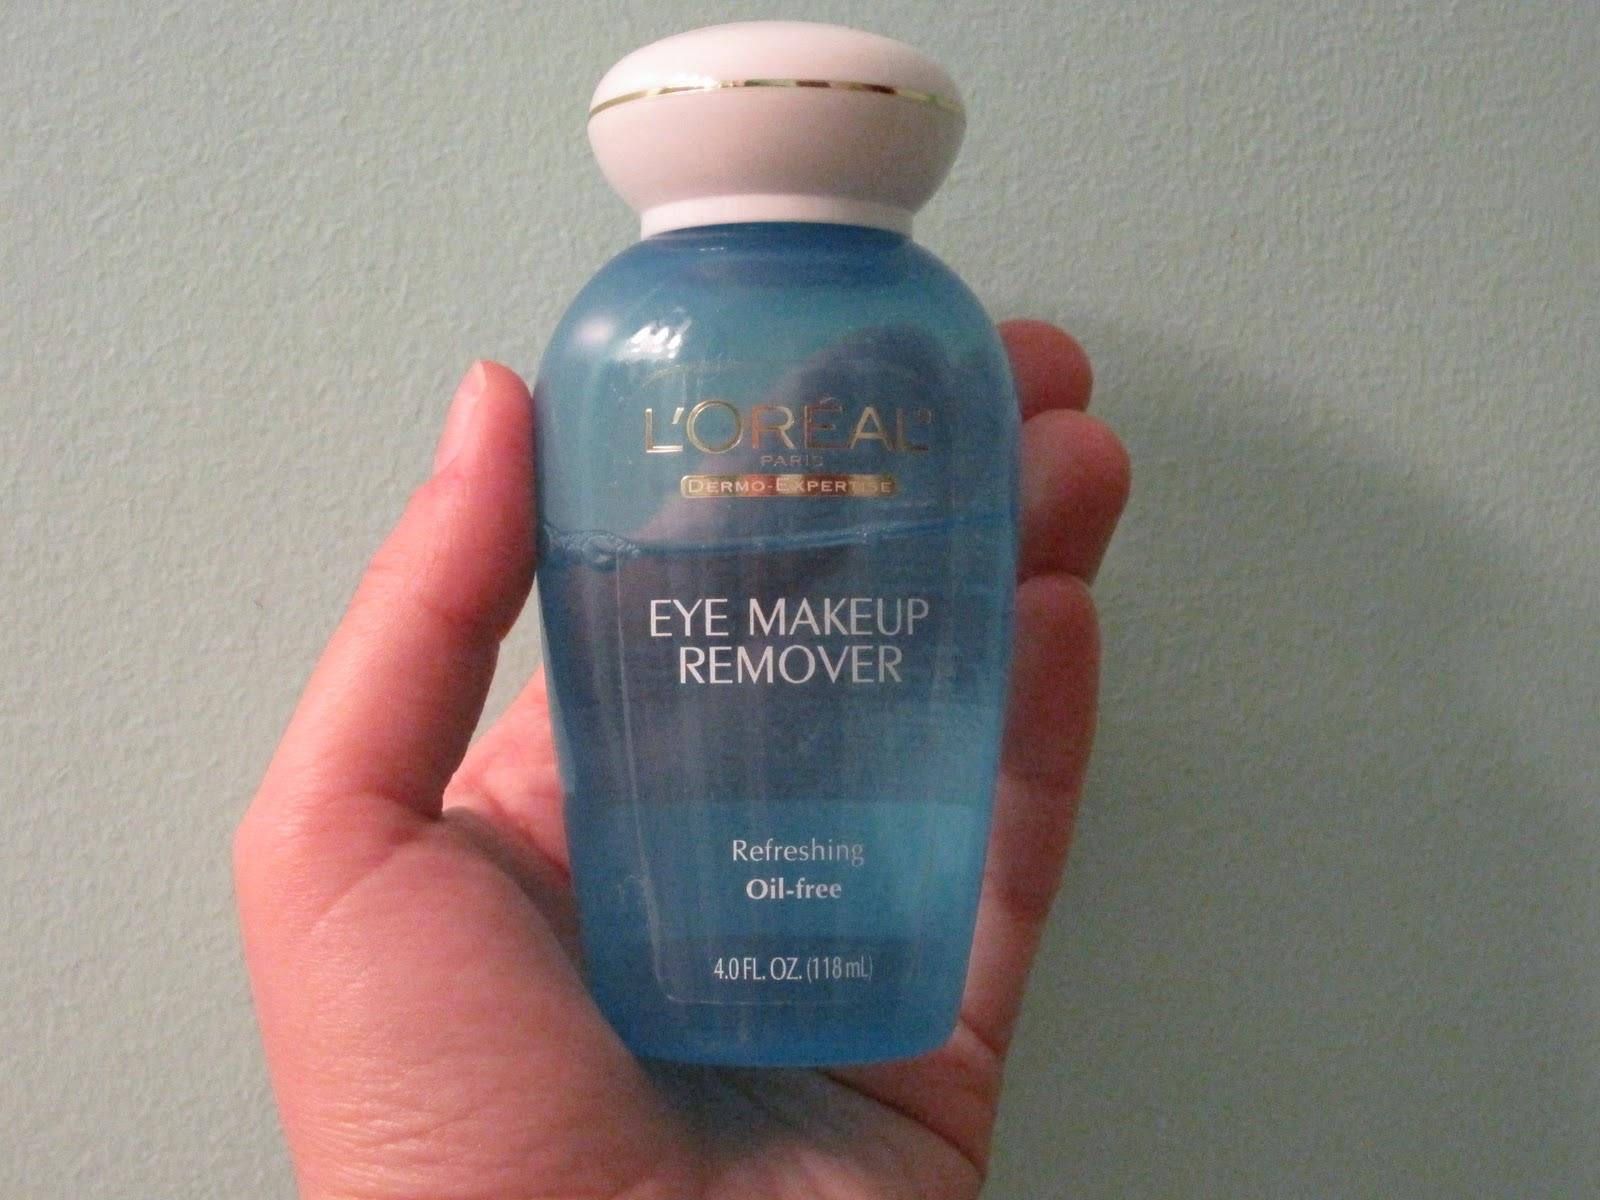 At home eye makeup remover